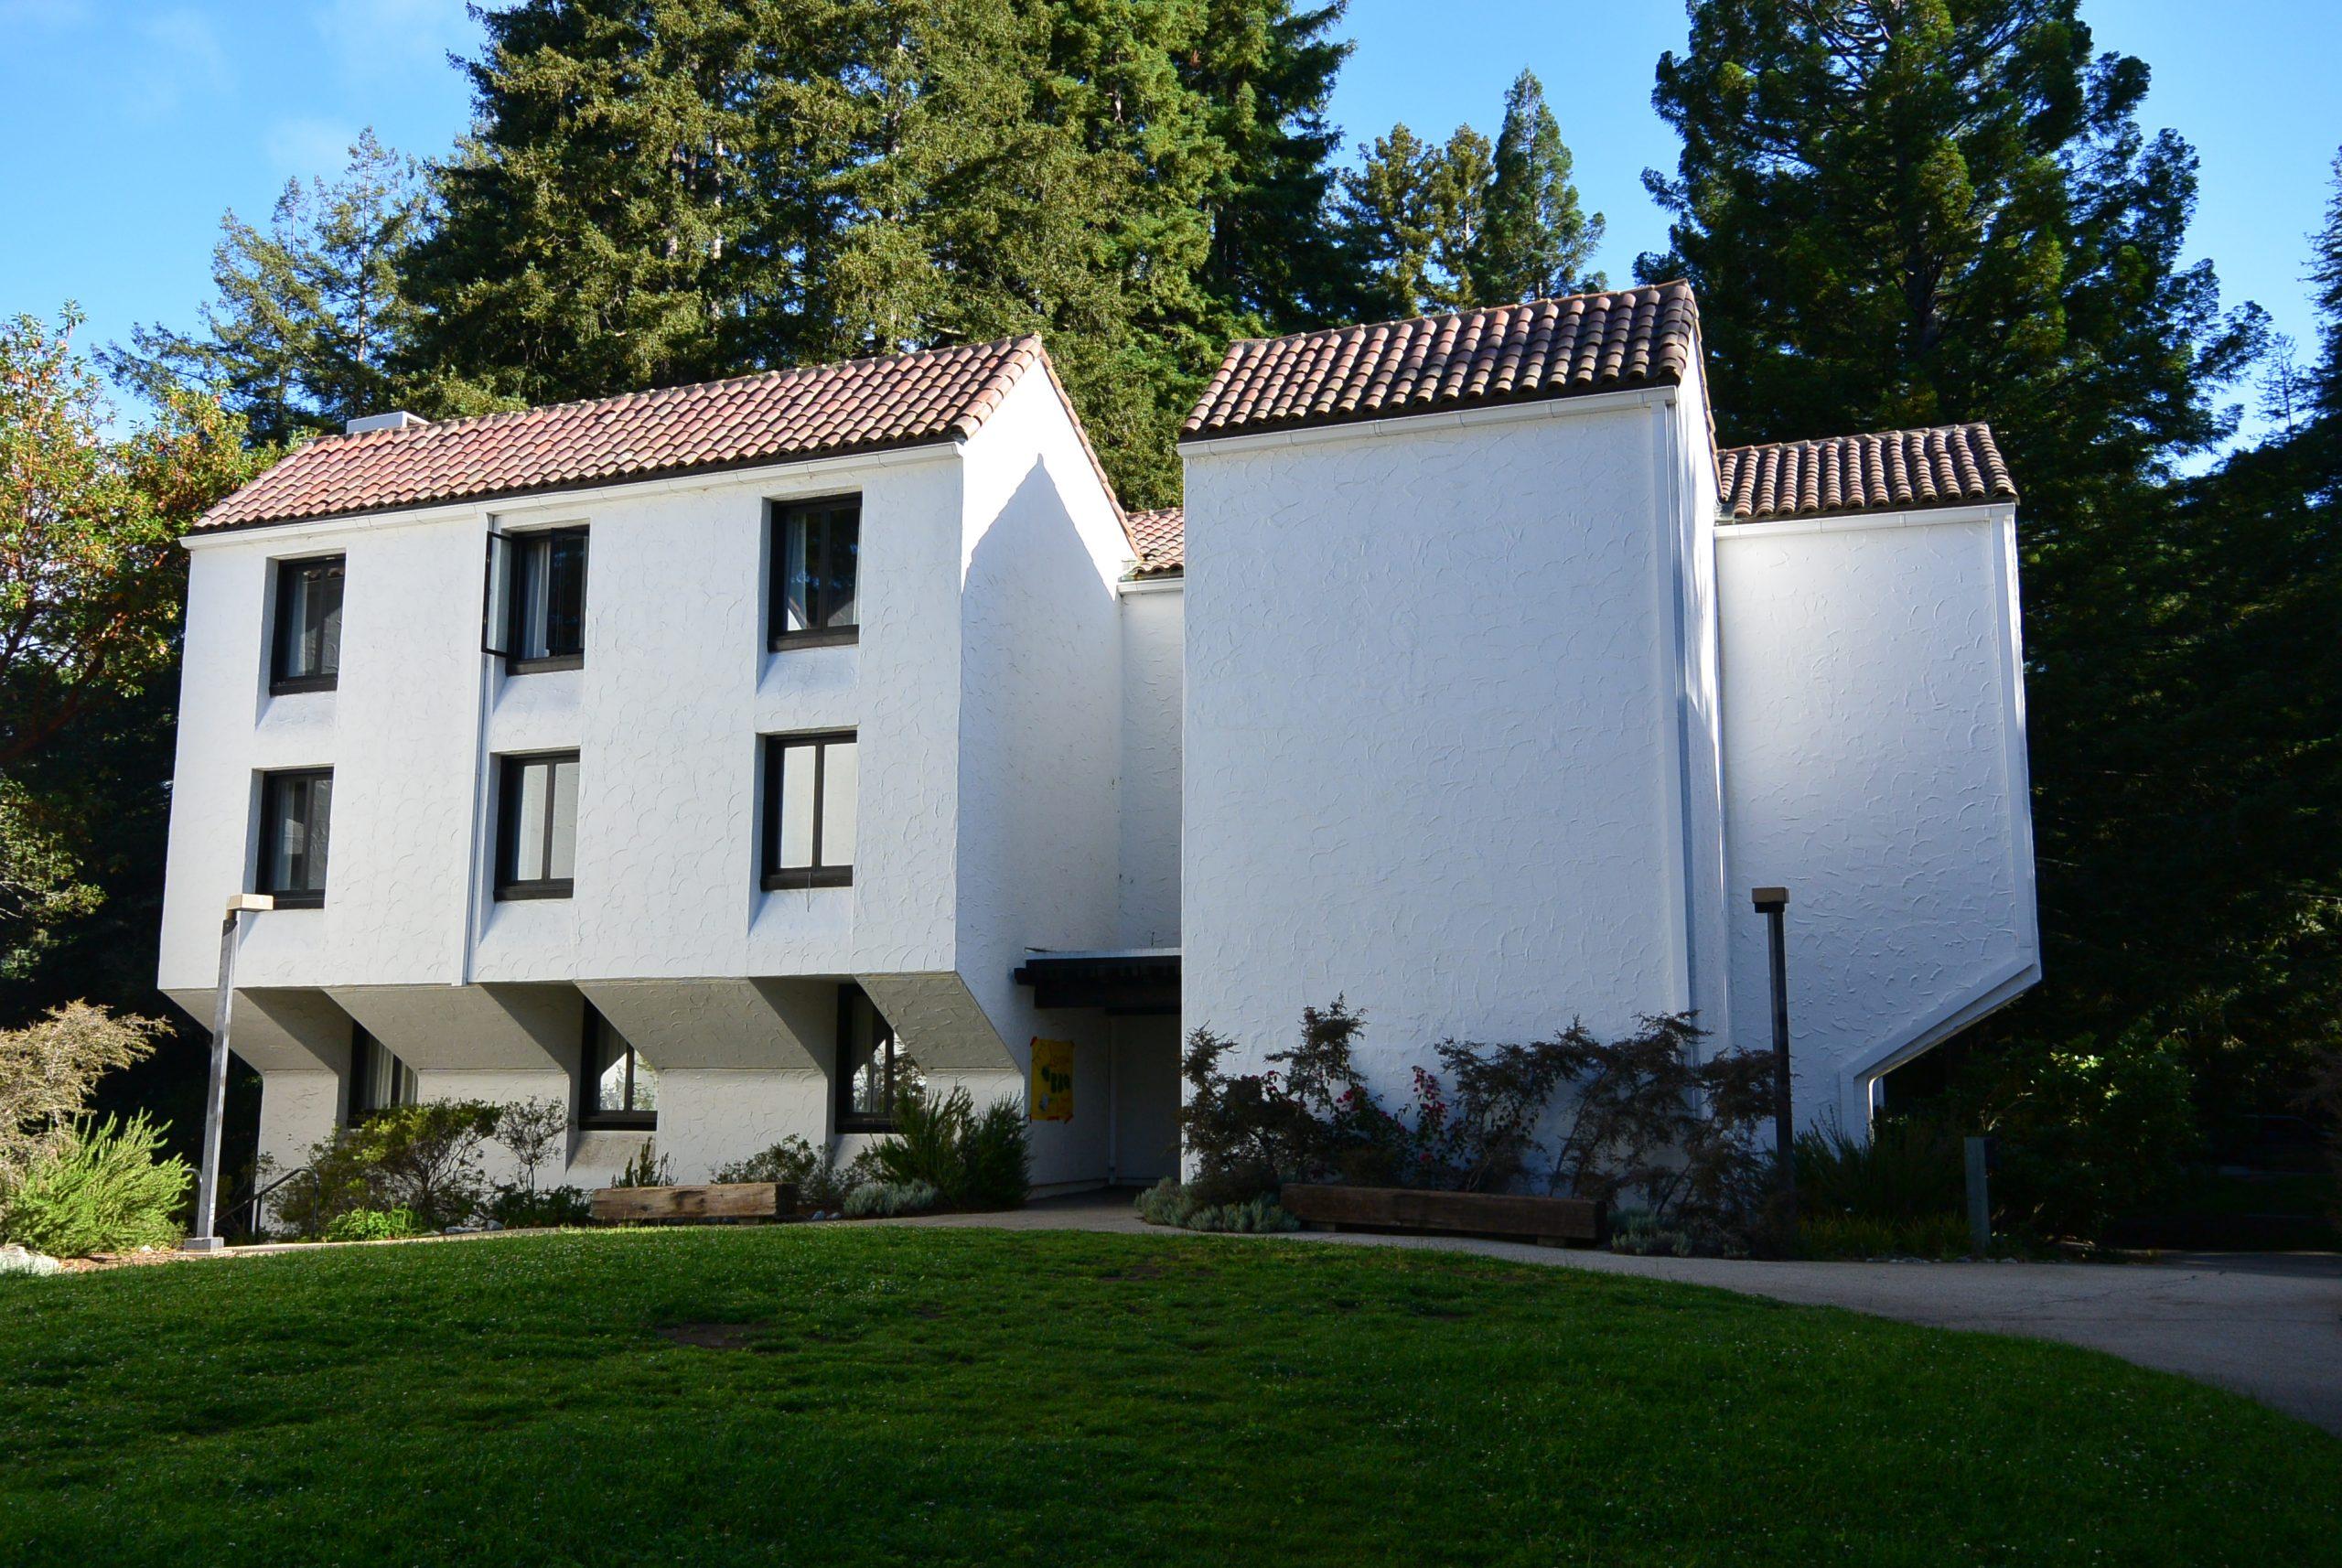 University of California, Santa Cruz's Crown College